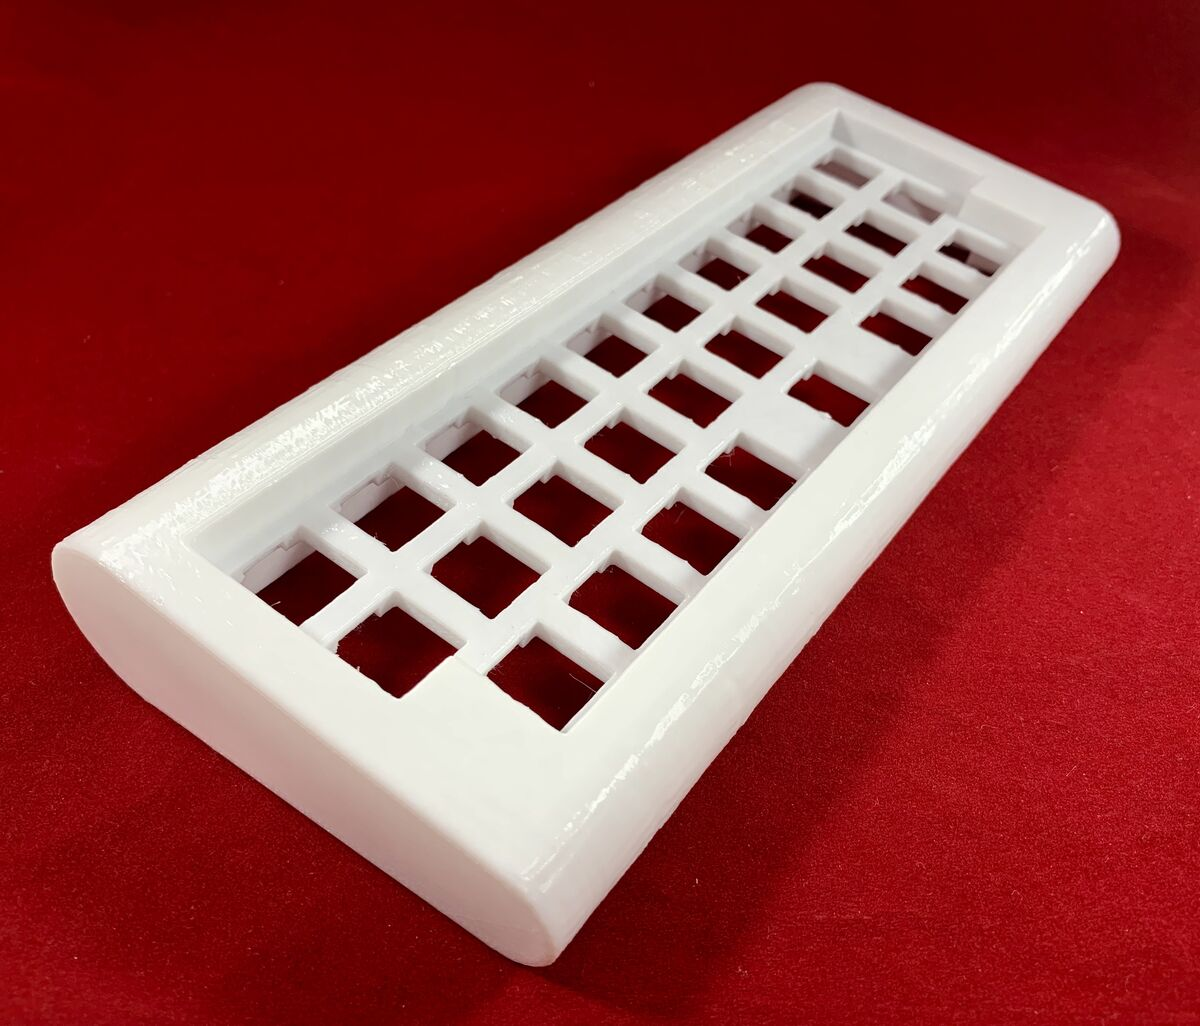 TronXY X5S 3D Printer (Reviews, Cost, Manual)